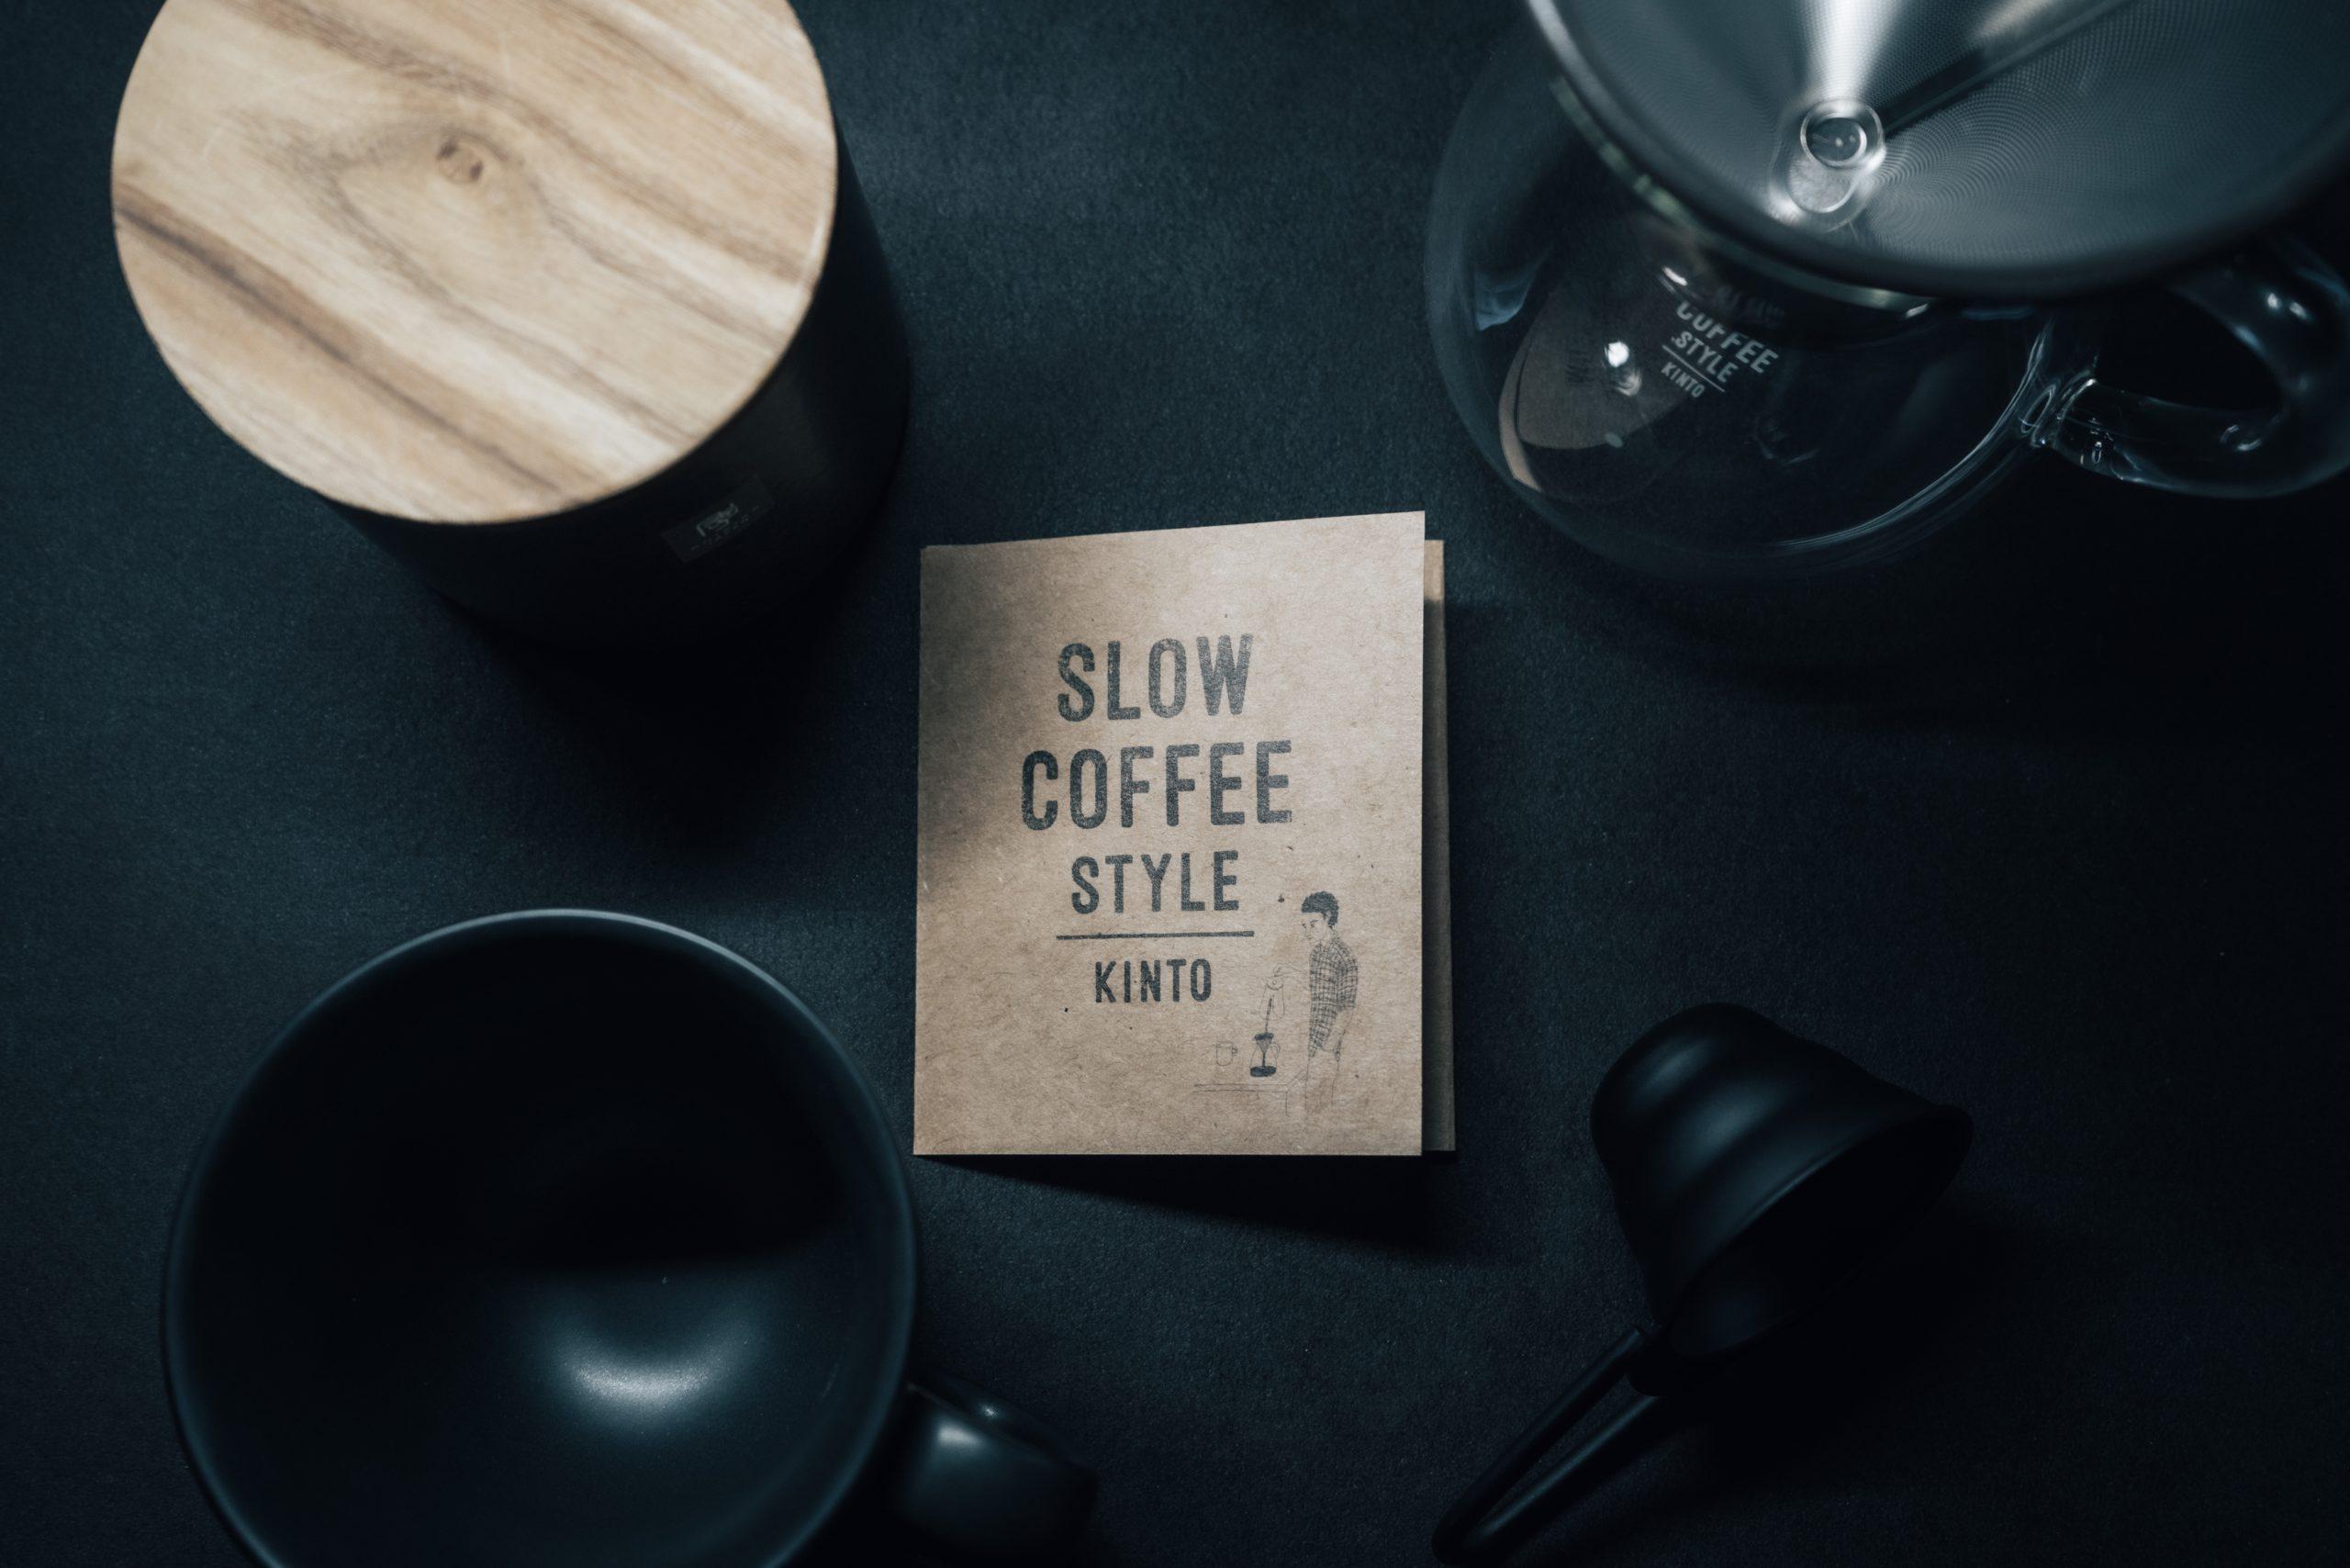 KINTO SLOW COFFEE STYLE